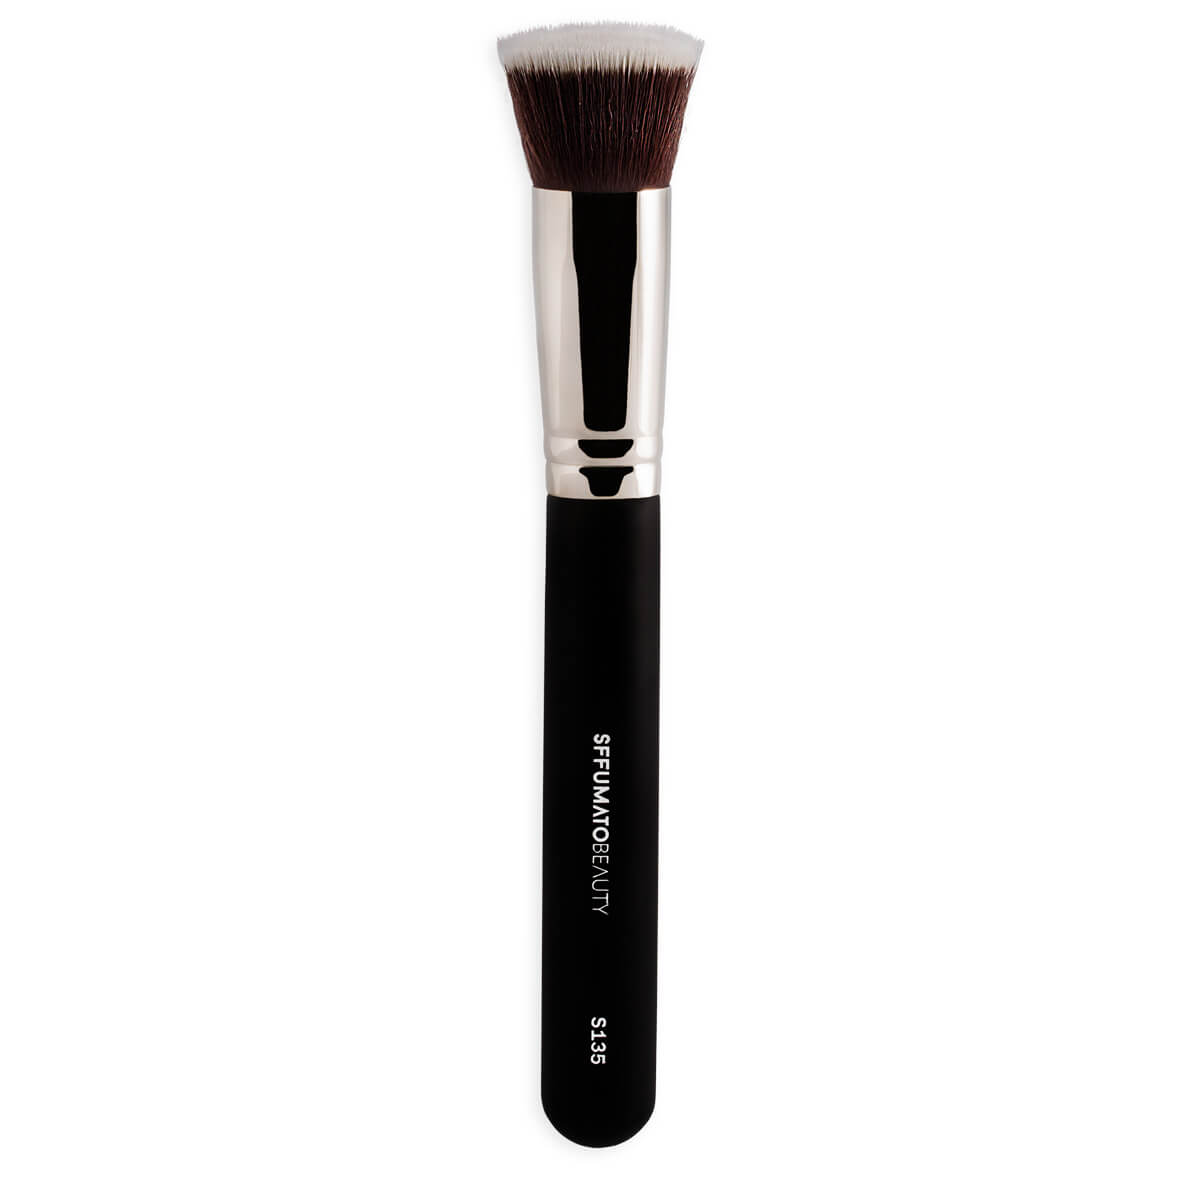 S135 - Pincel Kabuki Profissional Para Base Sffumato Beauty